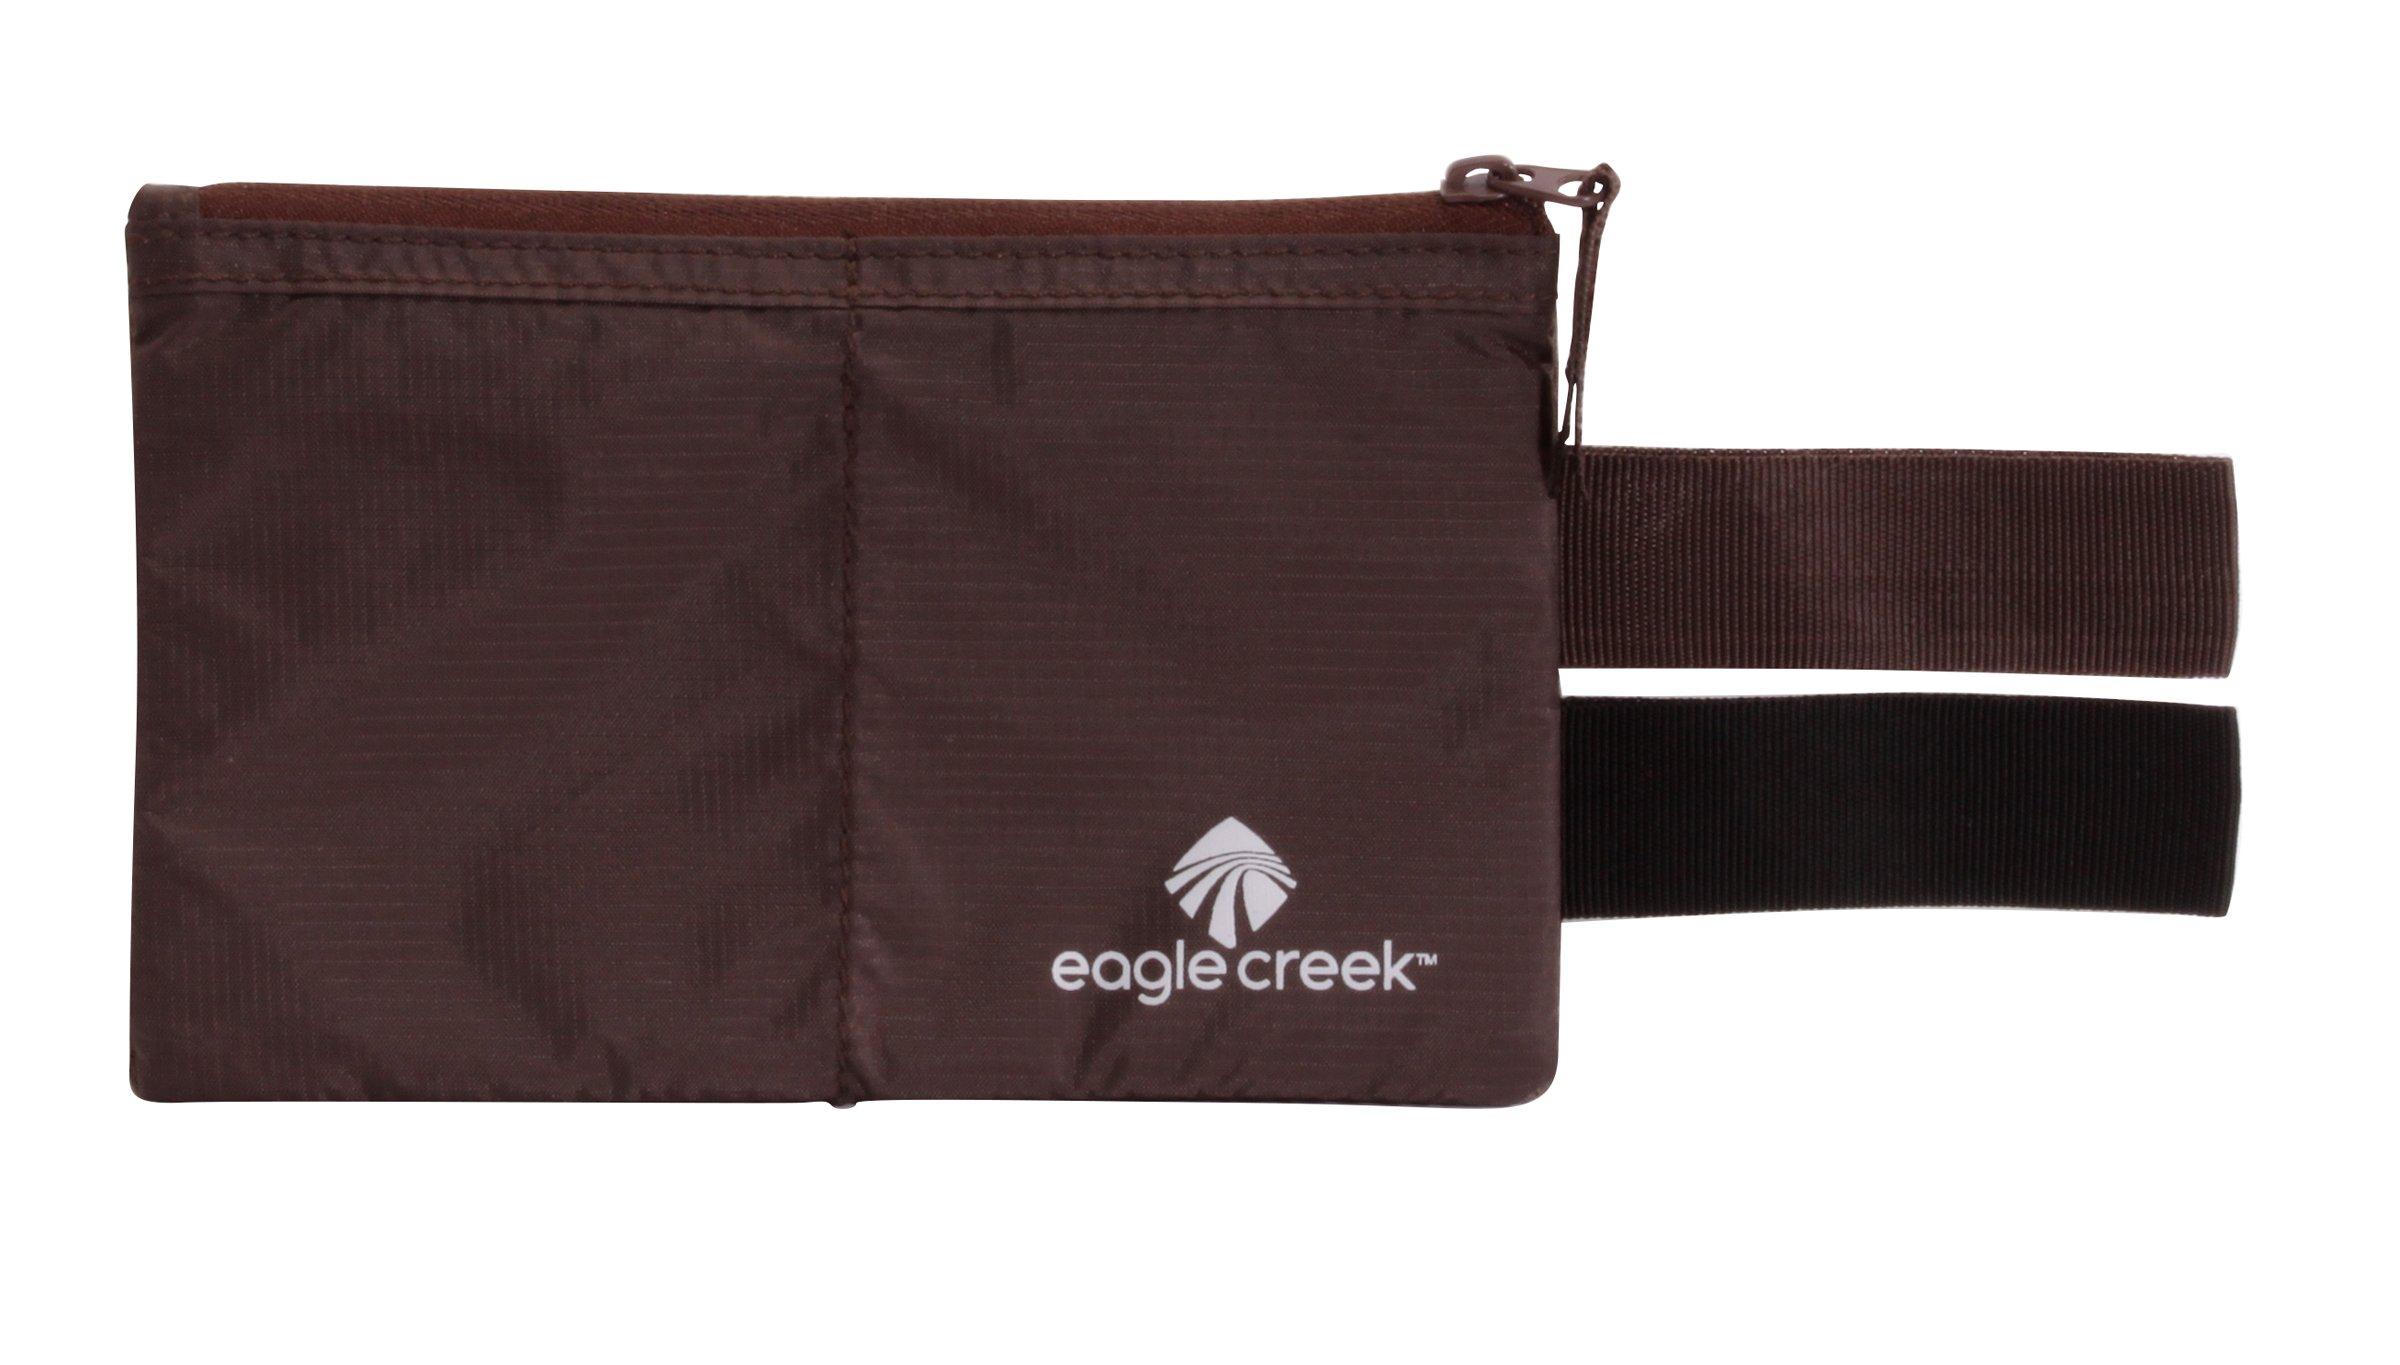 Eagle Creek Undercover Hidden Pocket, Mocha by Eagle Creek